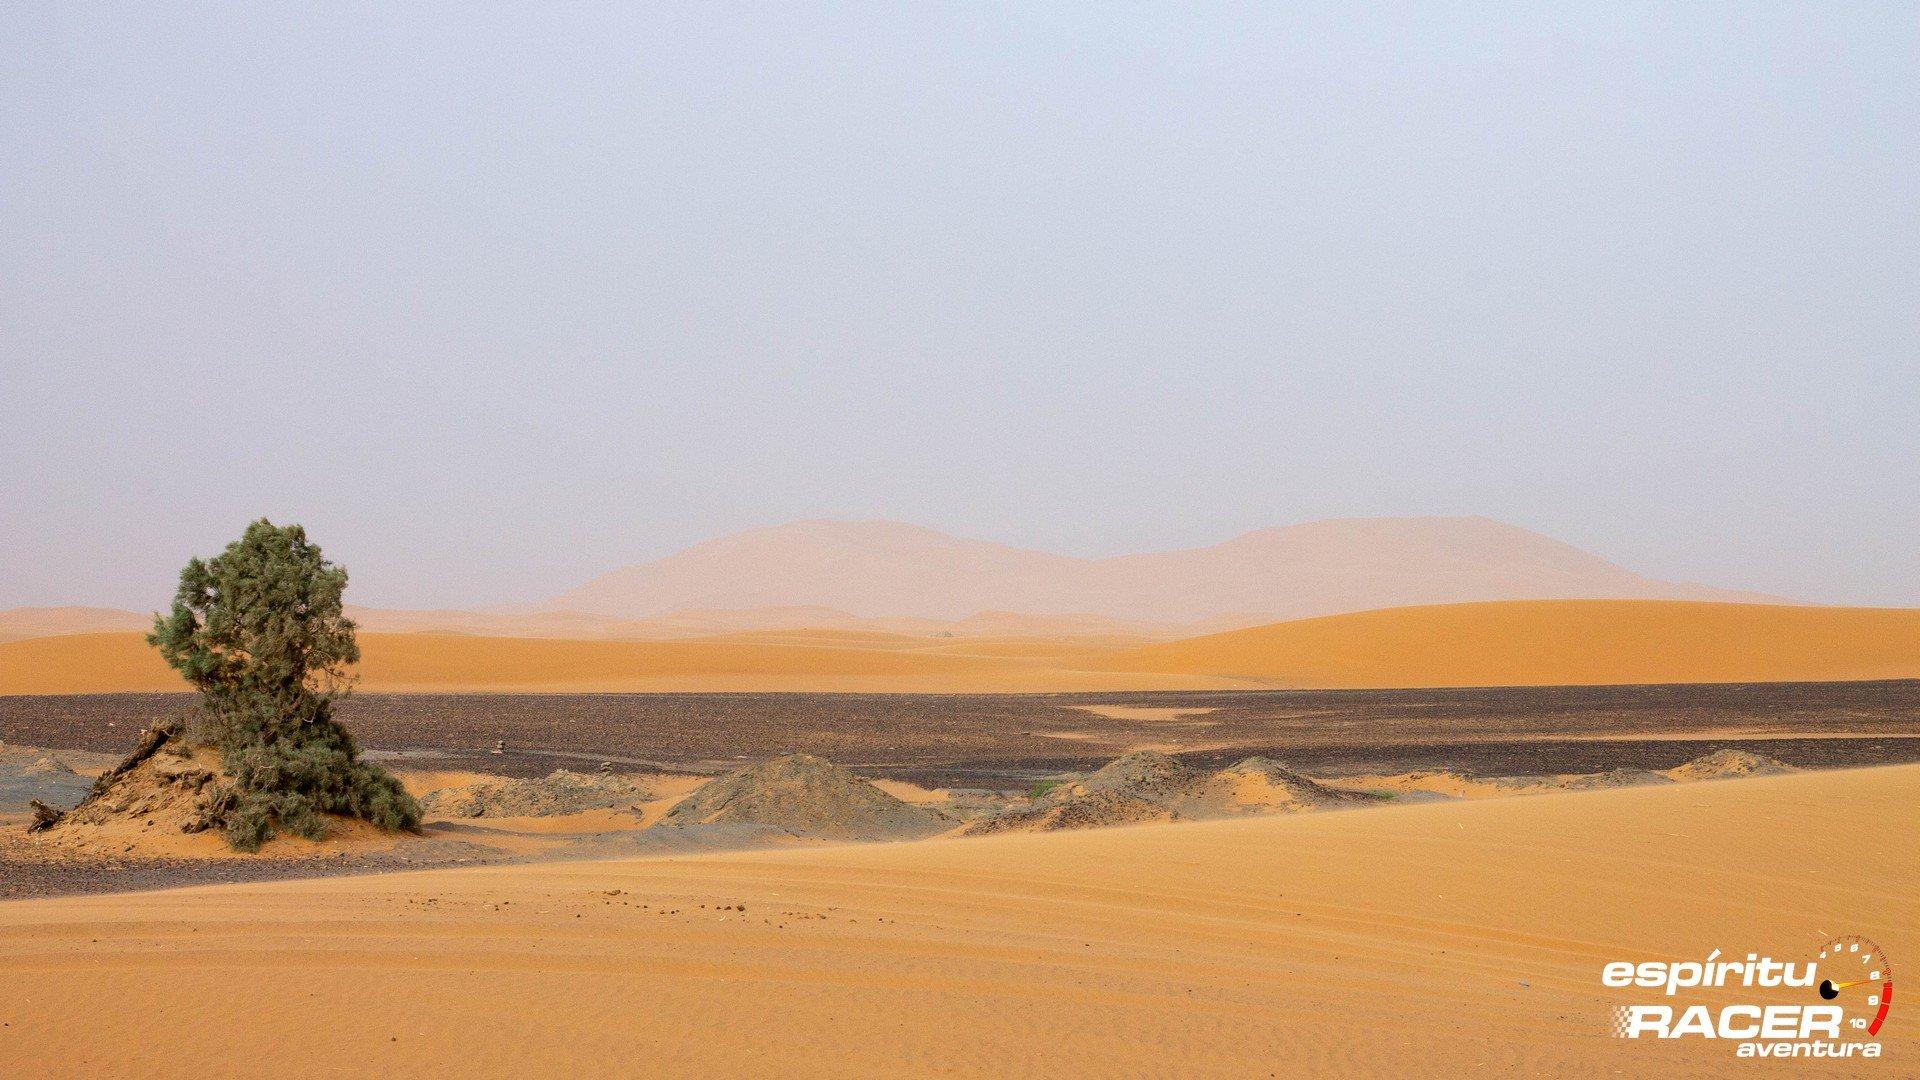 15 dias por Marruecos con Royal Enfield Himalayan 110